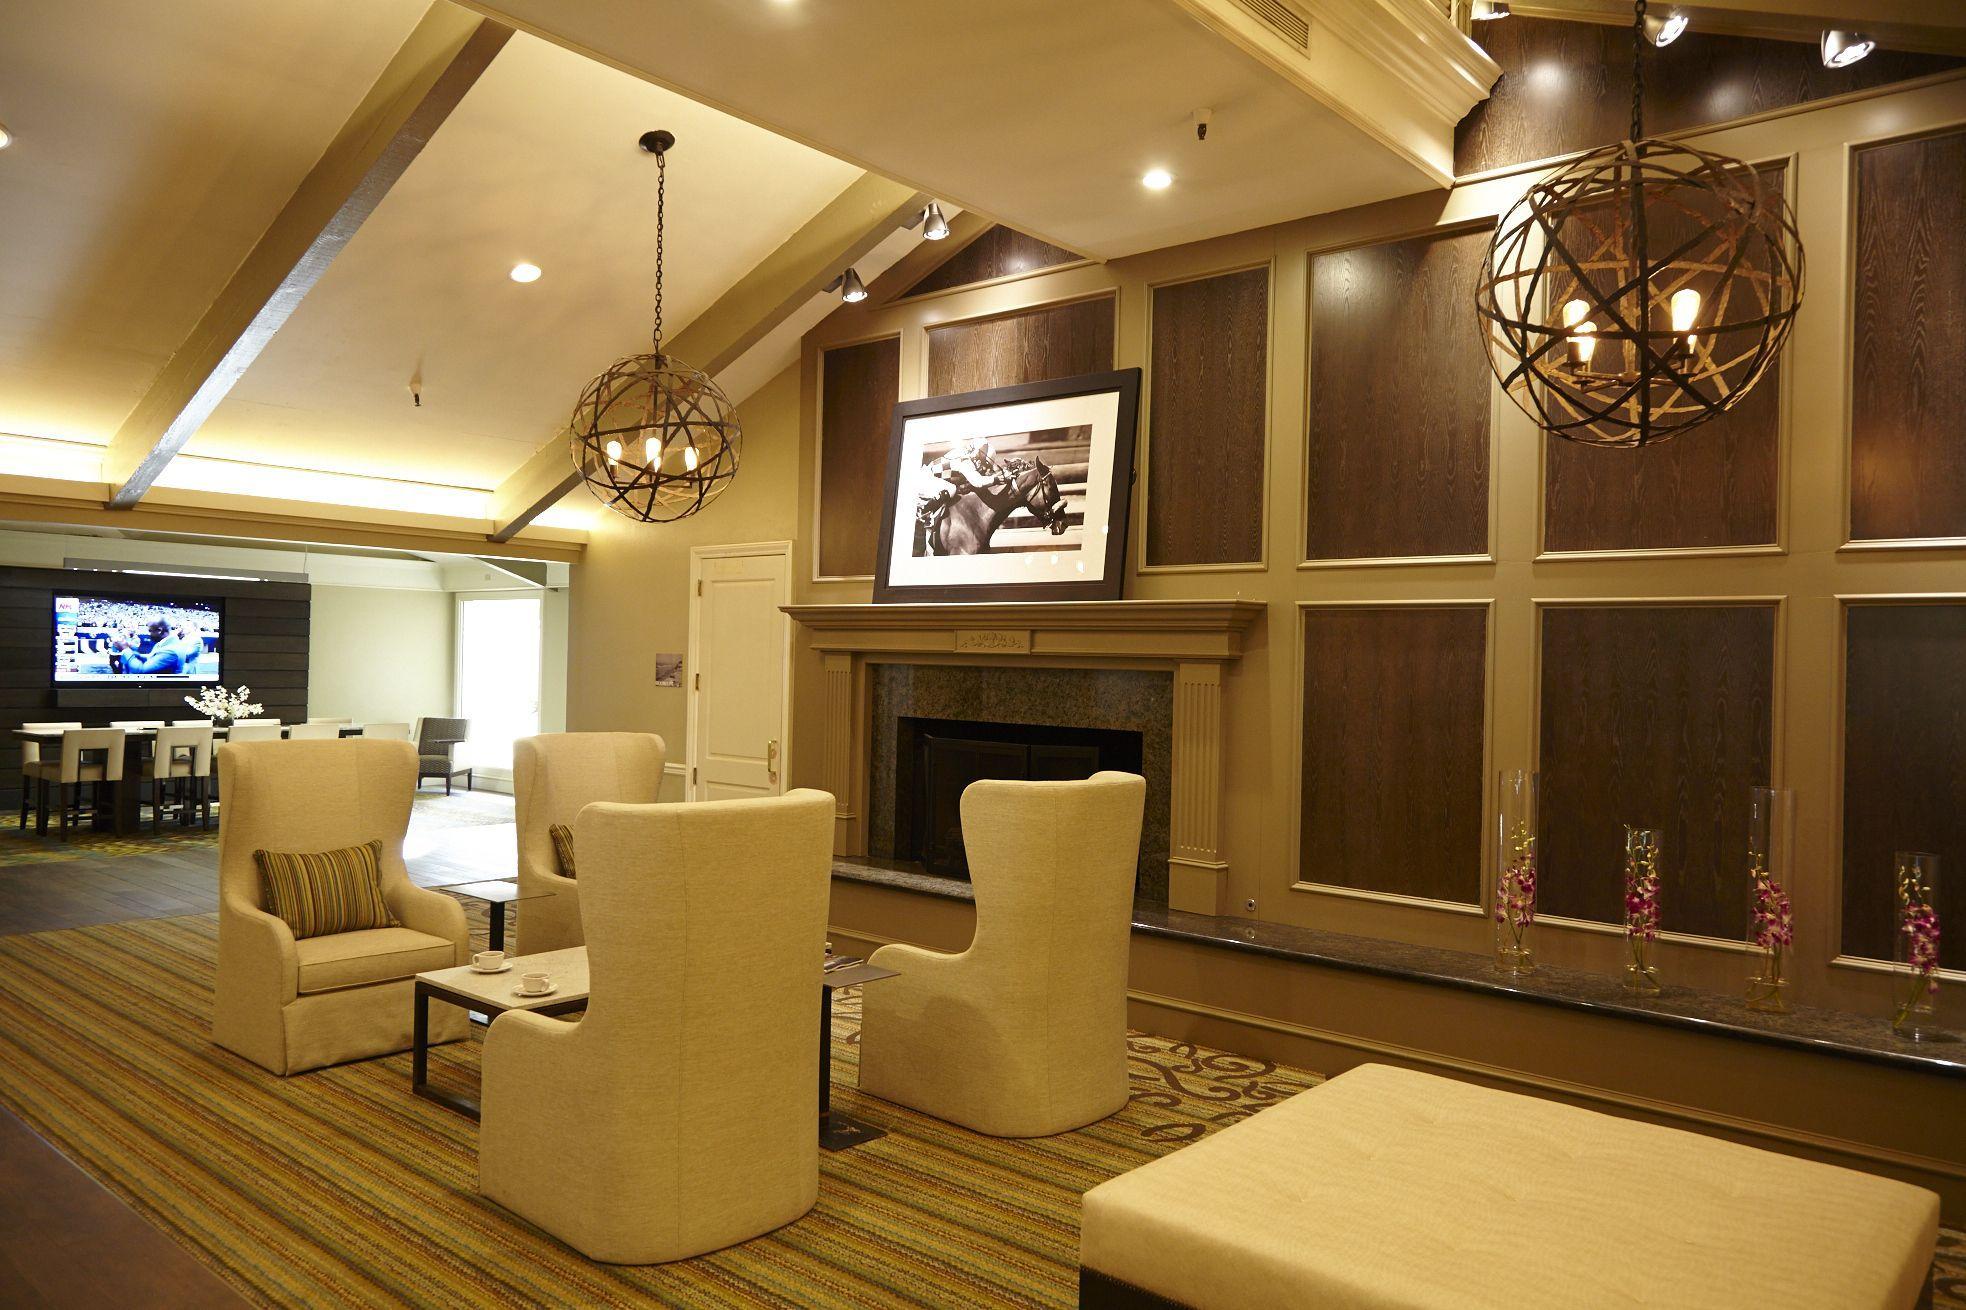 morgan run resort. Black Bedroom Furniture Sets. Home Design Ideas